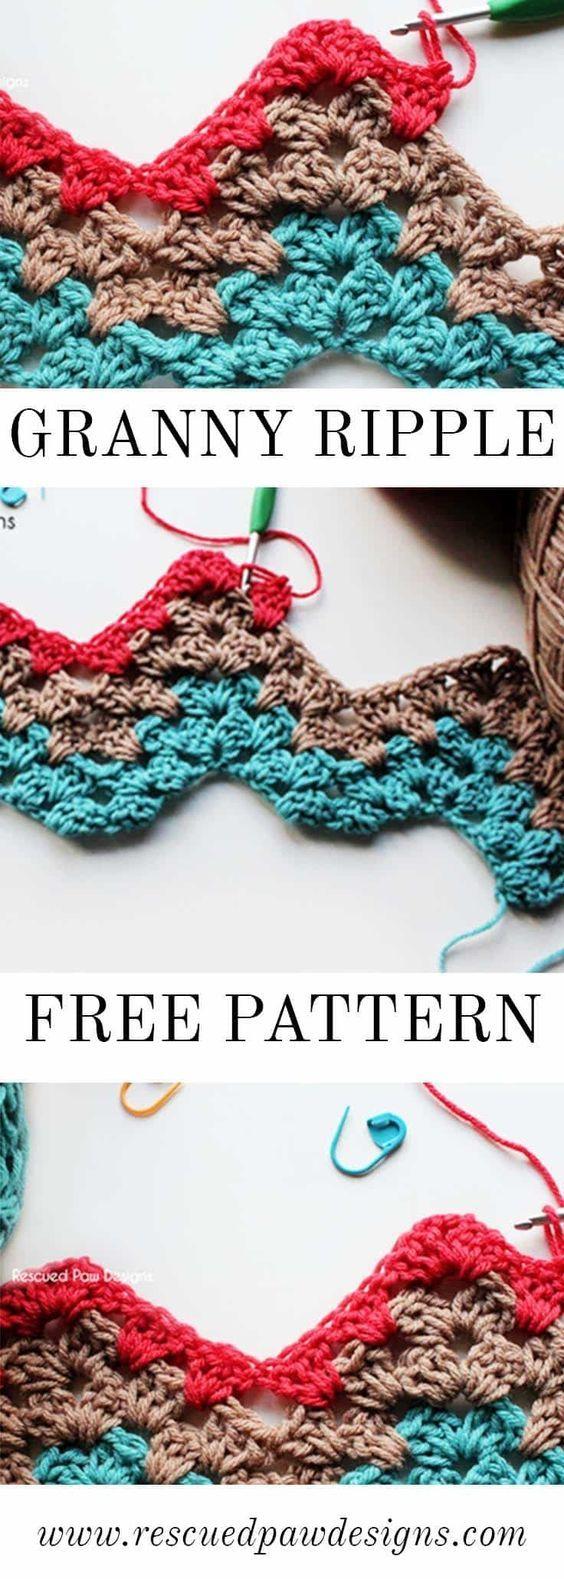 Granny Ripple Crochet Pattern - Make a Granny Ripple Afghan | Decken ...